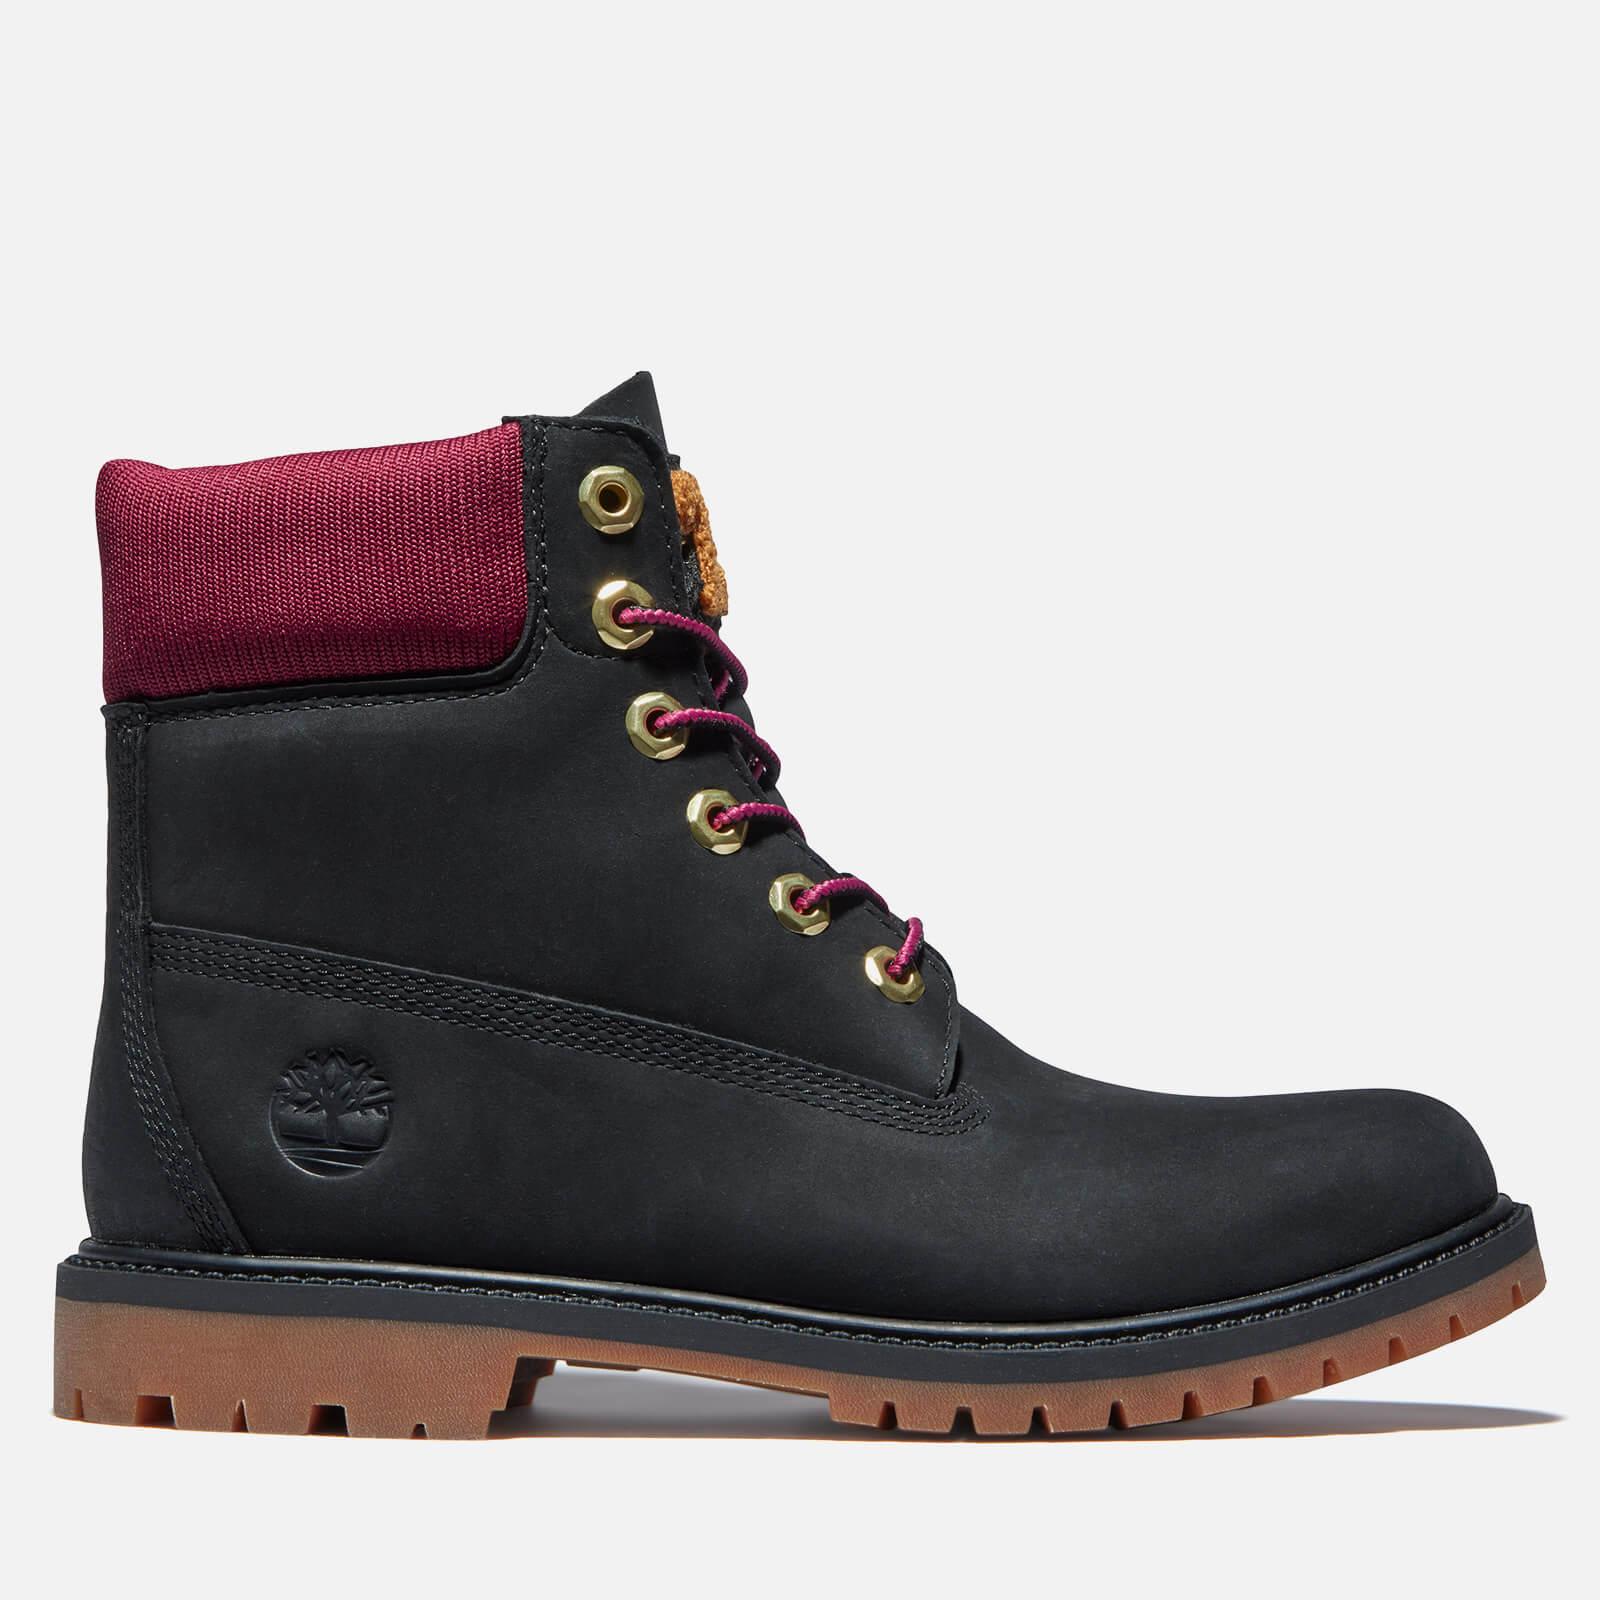 Timberland Women's 6 Inch Heritage Letterman Waterproof Boots - Black - UK 3